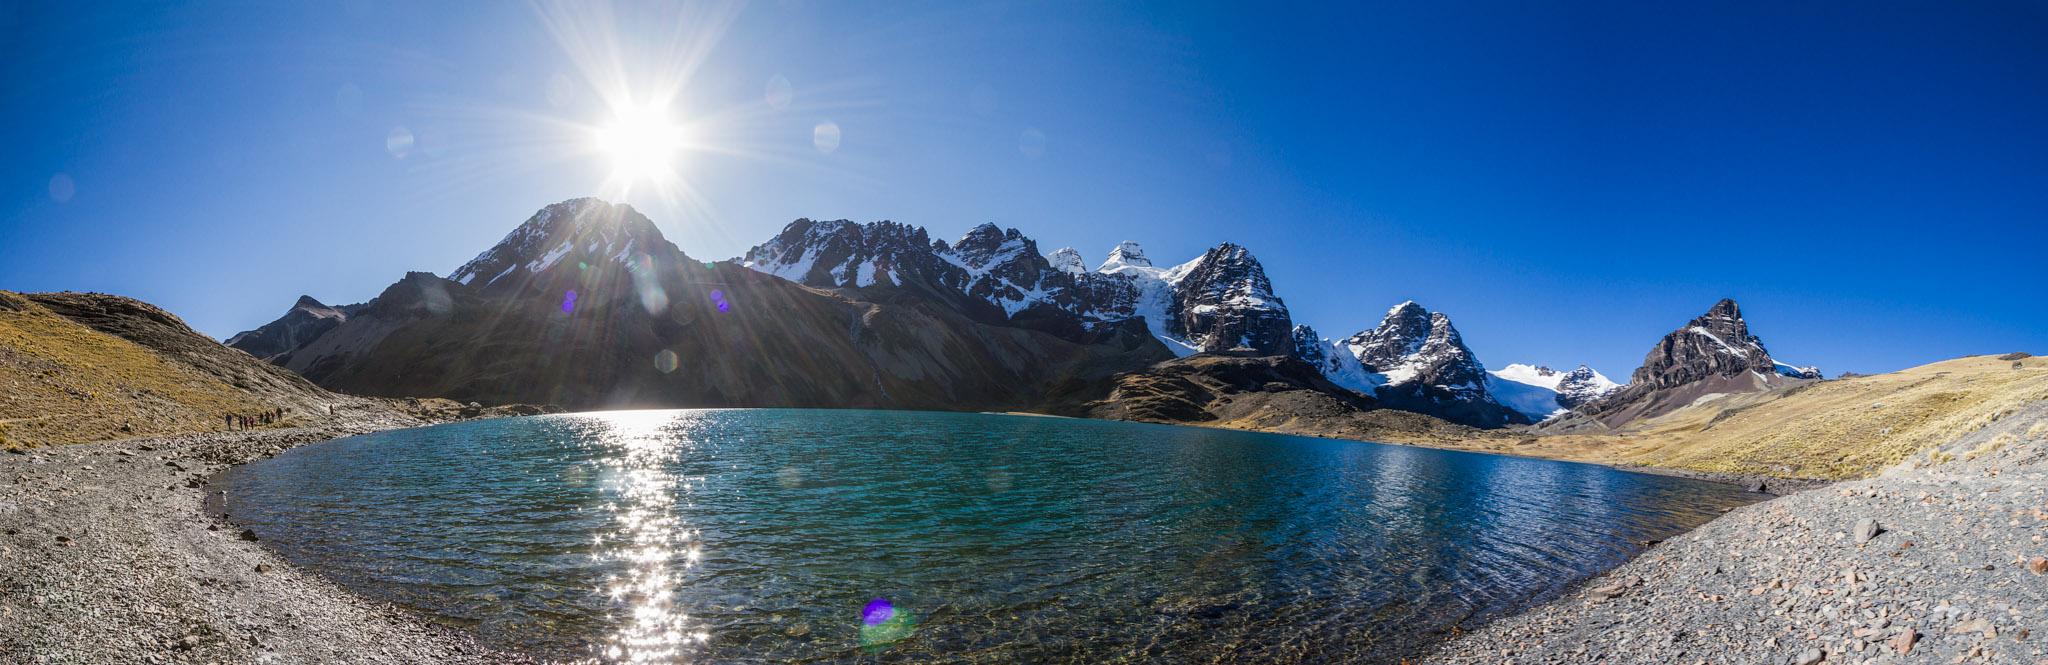 Ali-Barqawi-Studios-Explore-Series-Travel-Adventure-Documentary-C4CGAZA-Bolivia-Mount-Tarija-2015-124.jpg